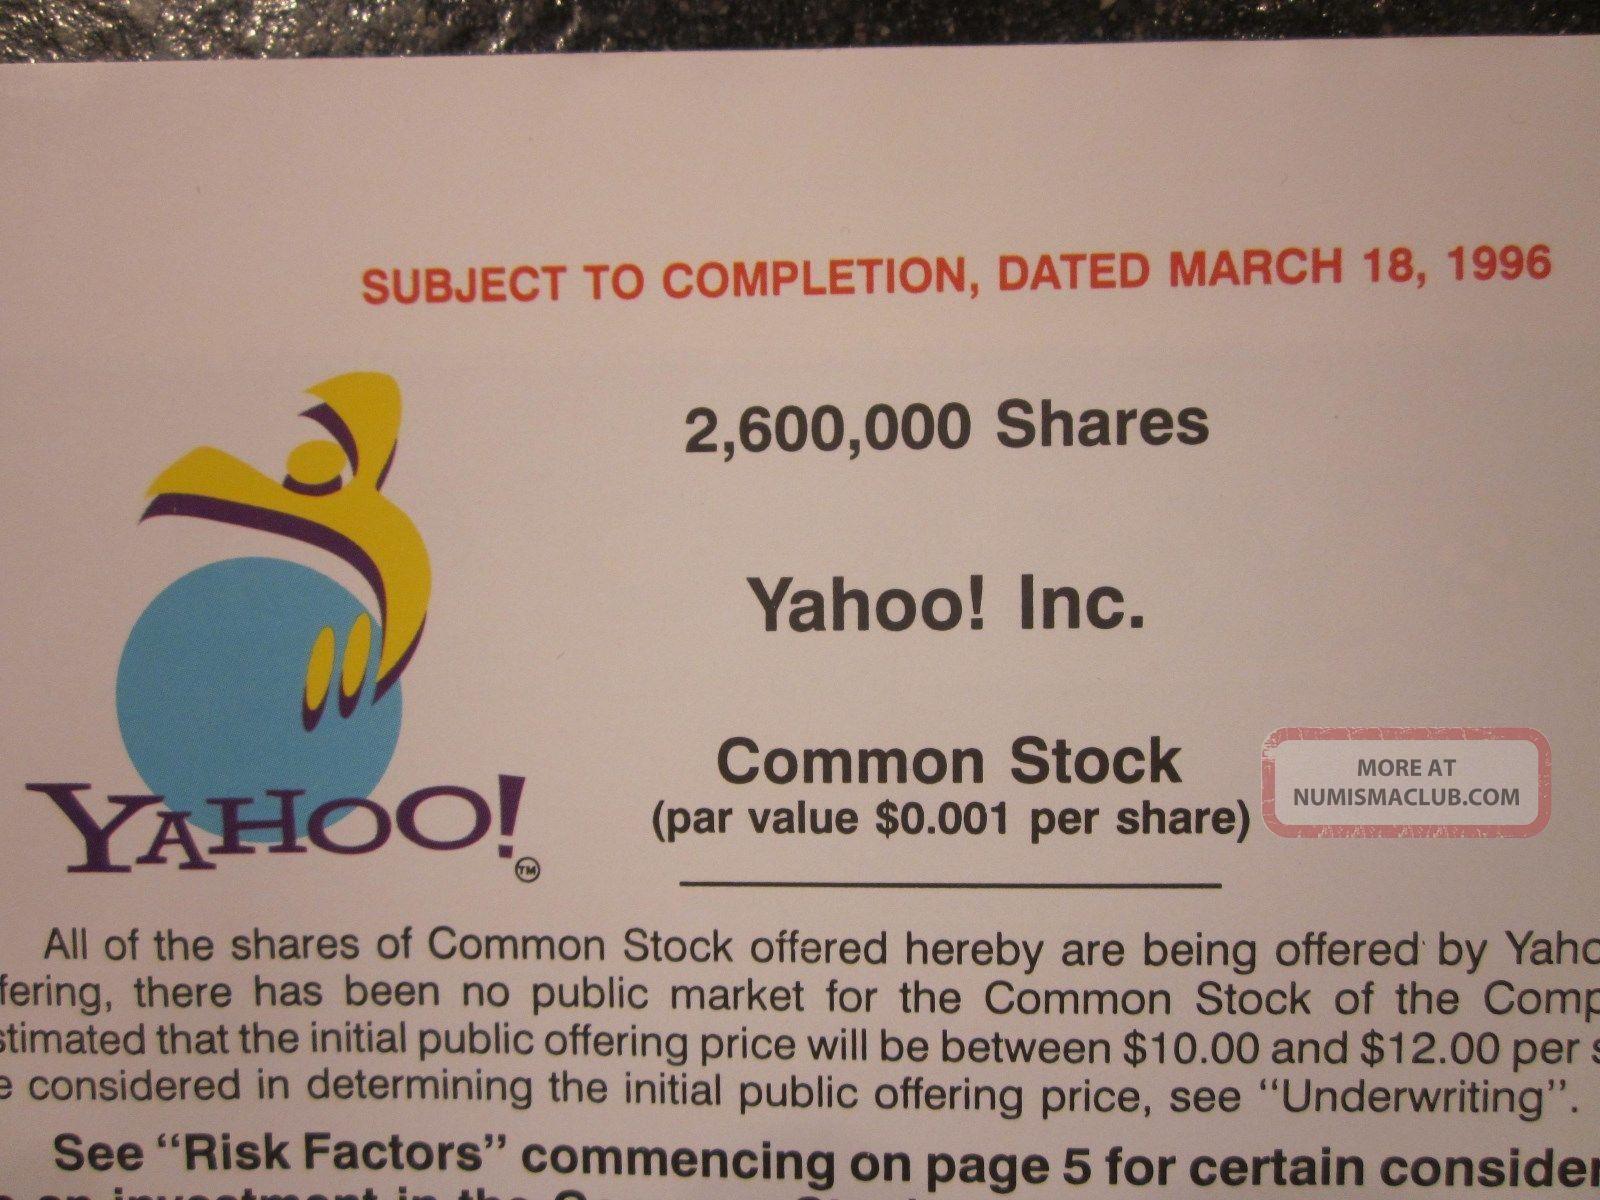 Yahoo Rare 1996 Ipo Prospectus Stock Market Investment Public Offering Stocks & Bonds, Scripophily photo